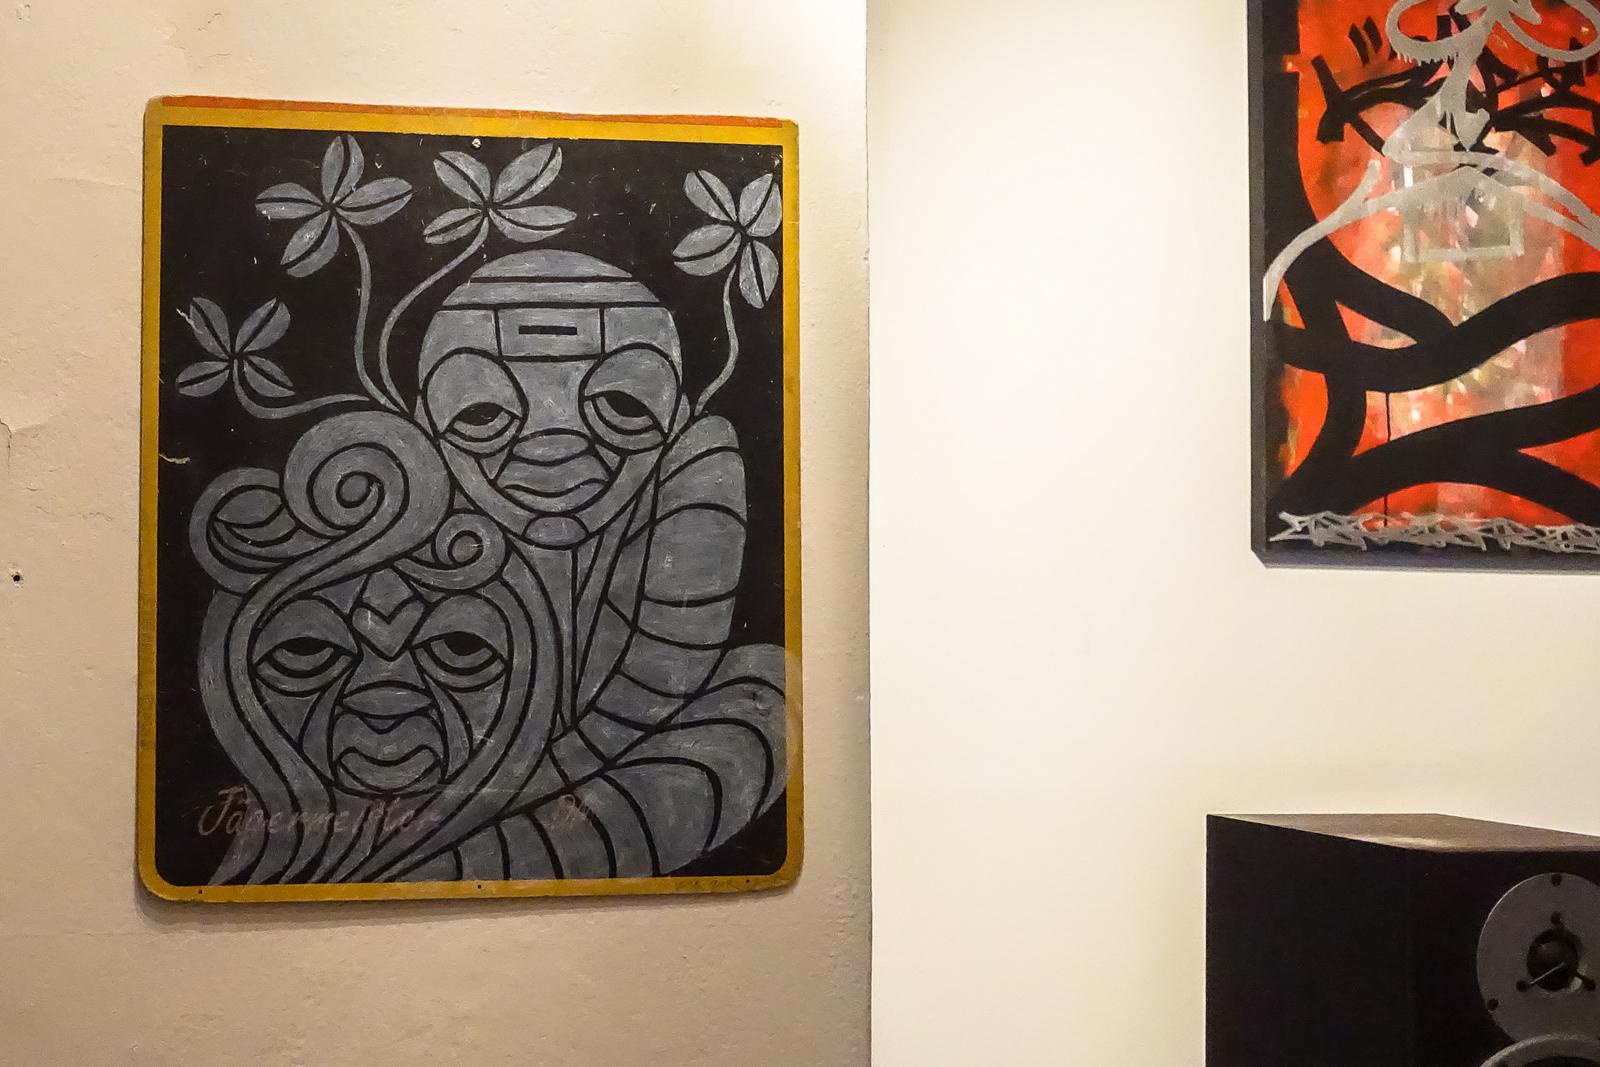 zor zore zor exhibition berlin vorwahl loft urbanpresents. Black Bedroom Furniture Sets. Home Design Ideas